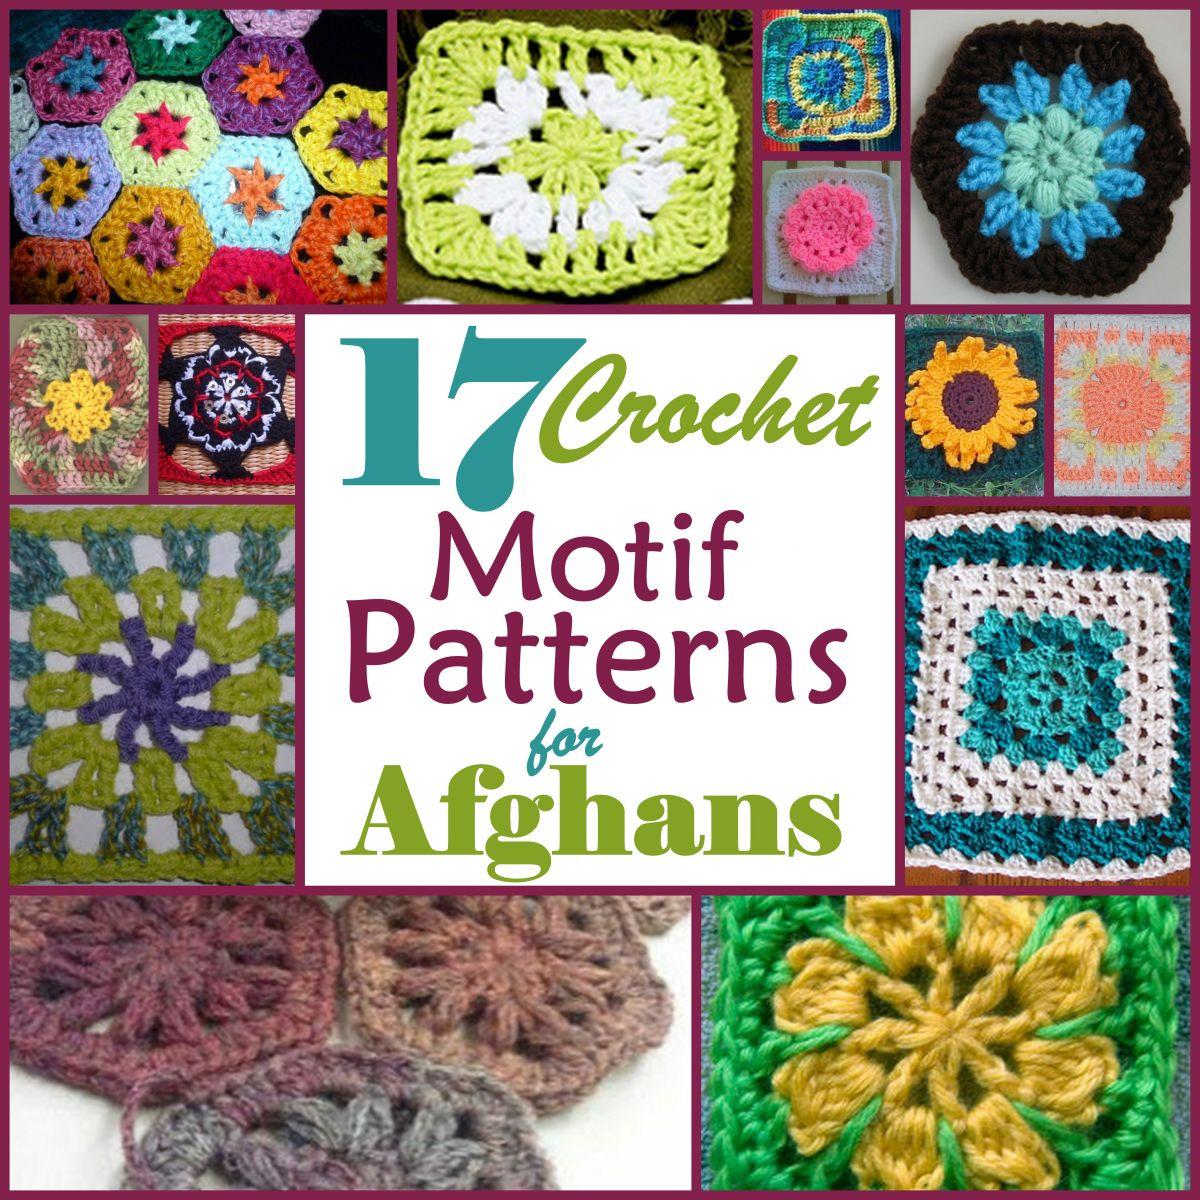 Free Patterns Crochet Motifs : 17 Motif Crochet Patterns for Afghans ...